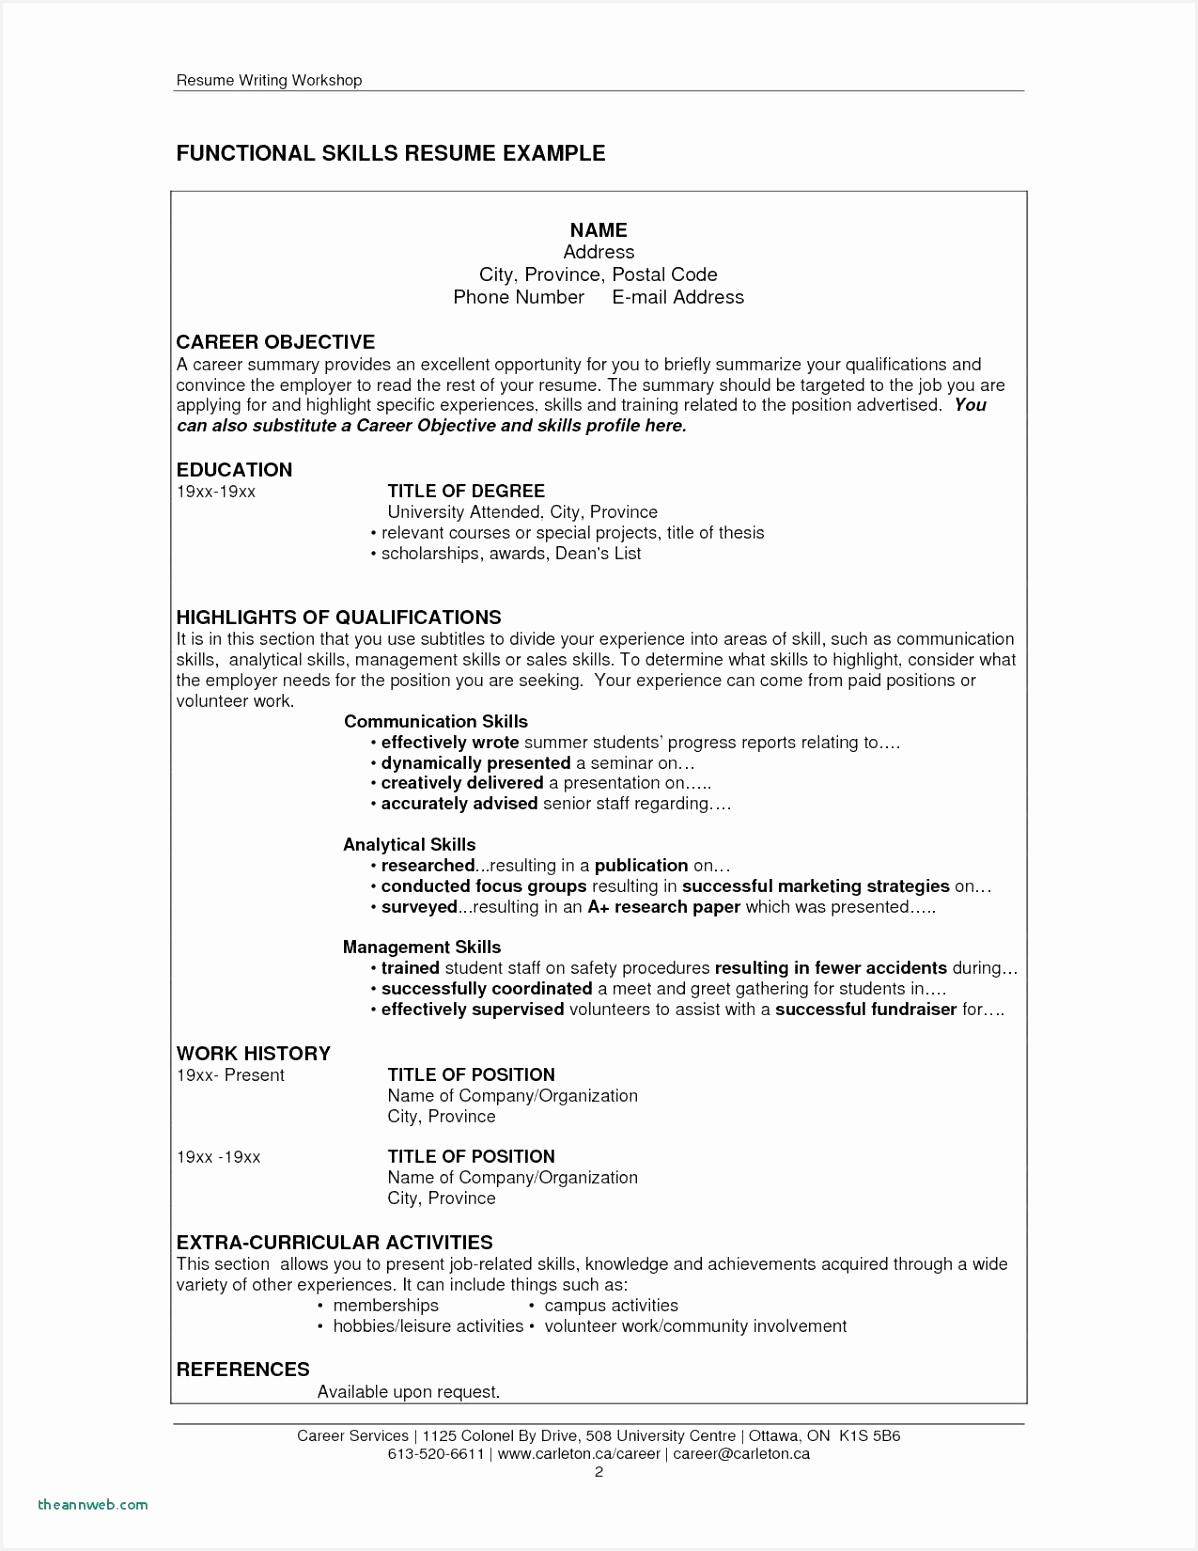 Veteran Resume Sample Tdara Luxury Resume Sample for Fresh Graduates Marketing Resume Cover Letter Of 10 Veteran Resume Sample